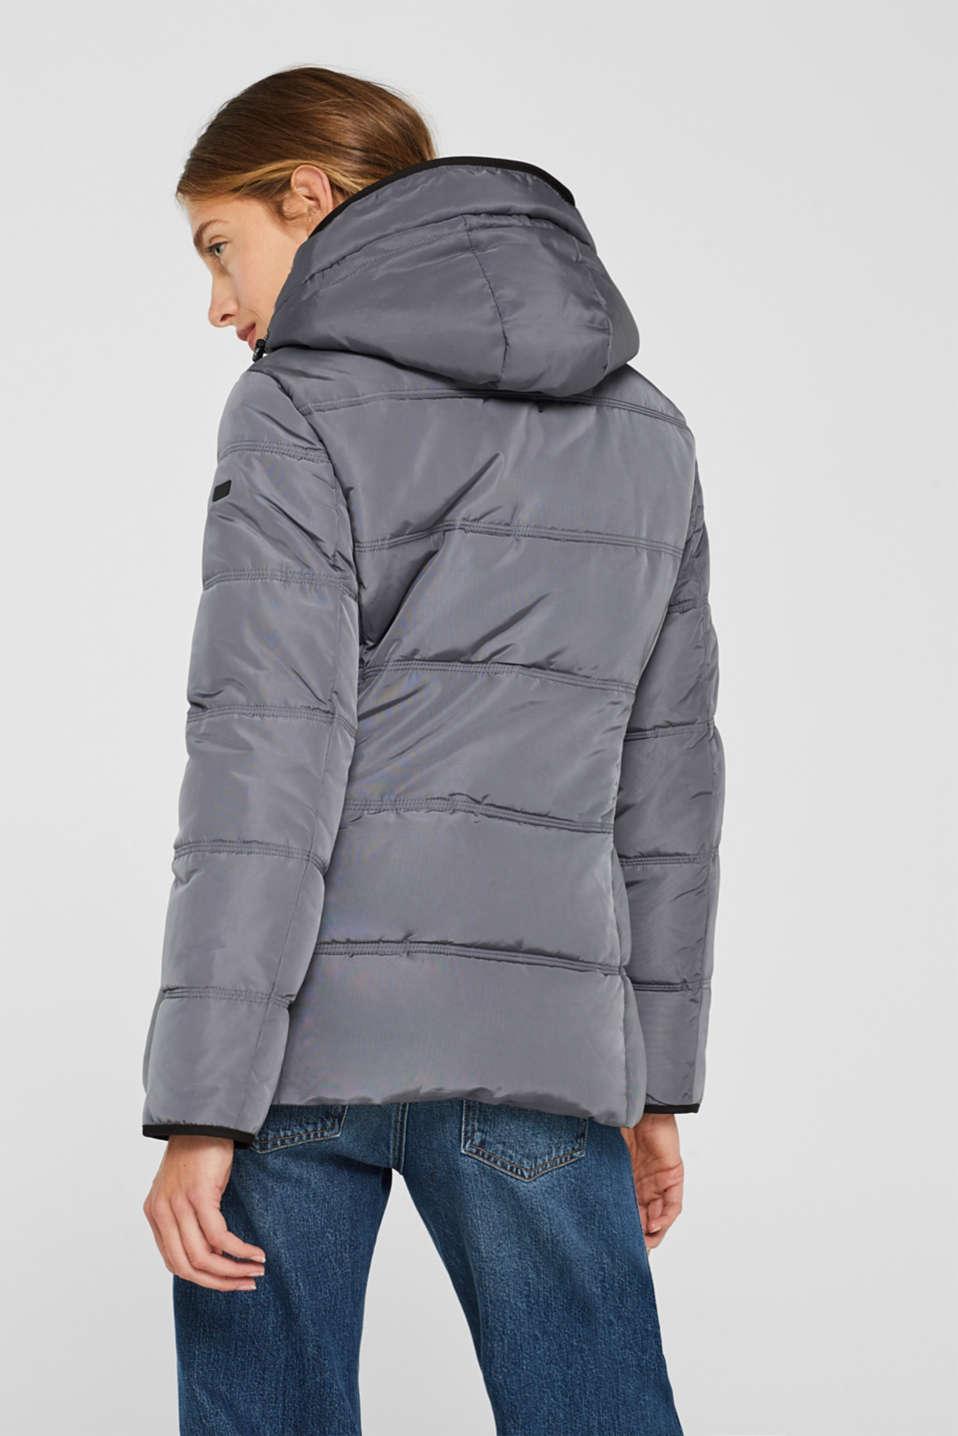 Jackets outdoor woven, DARK GREY, detail image number 3